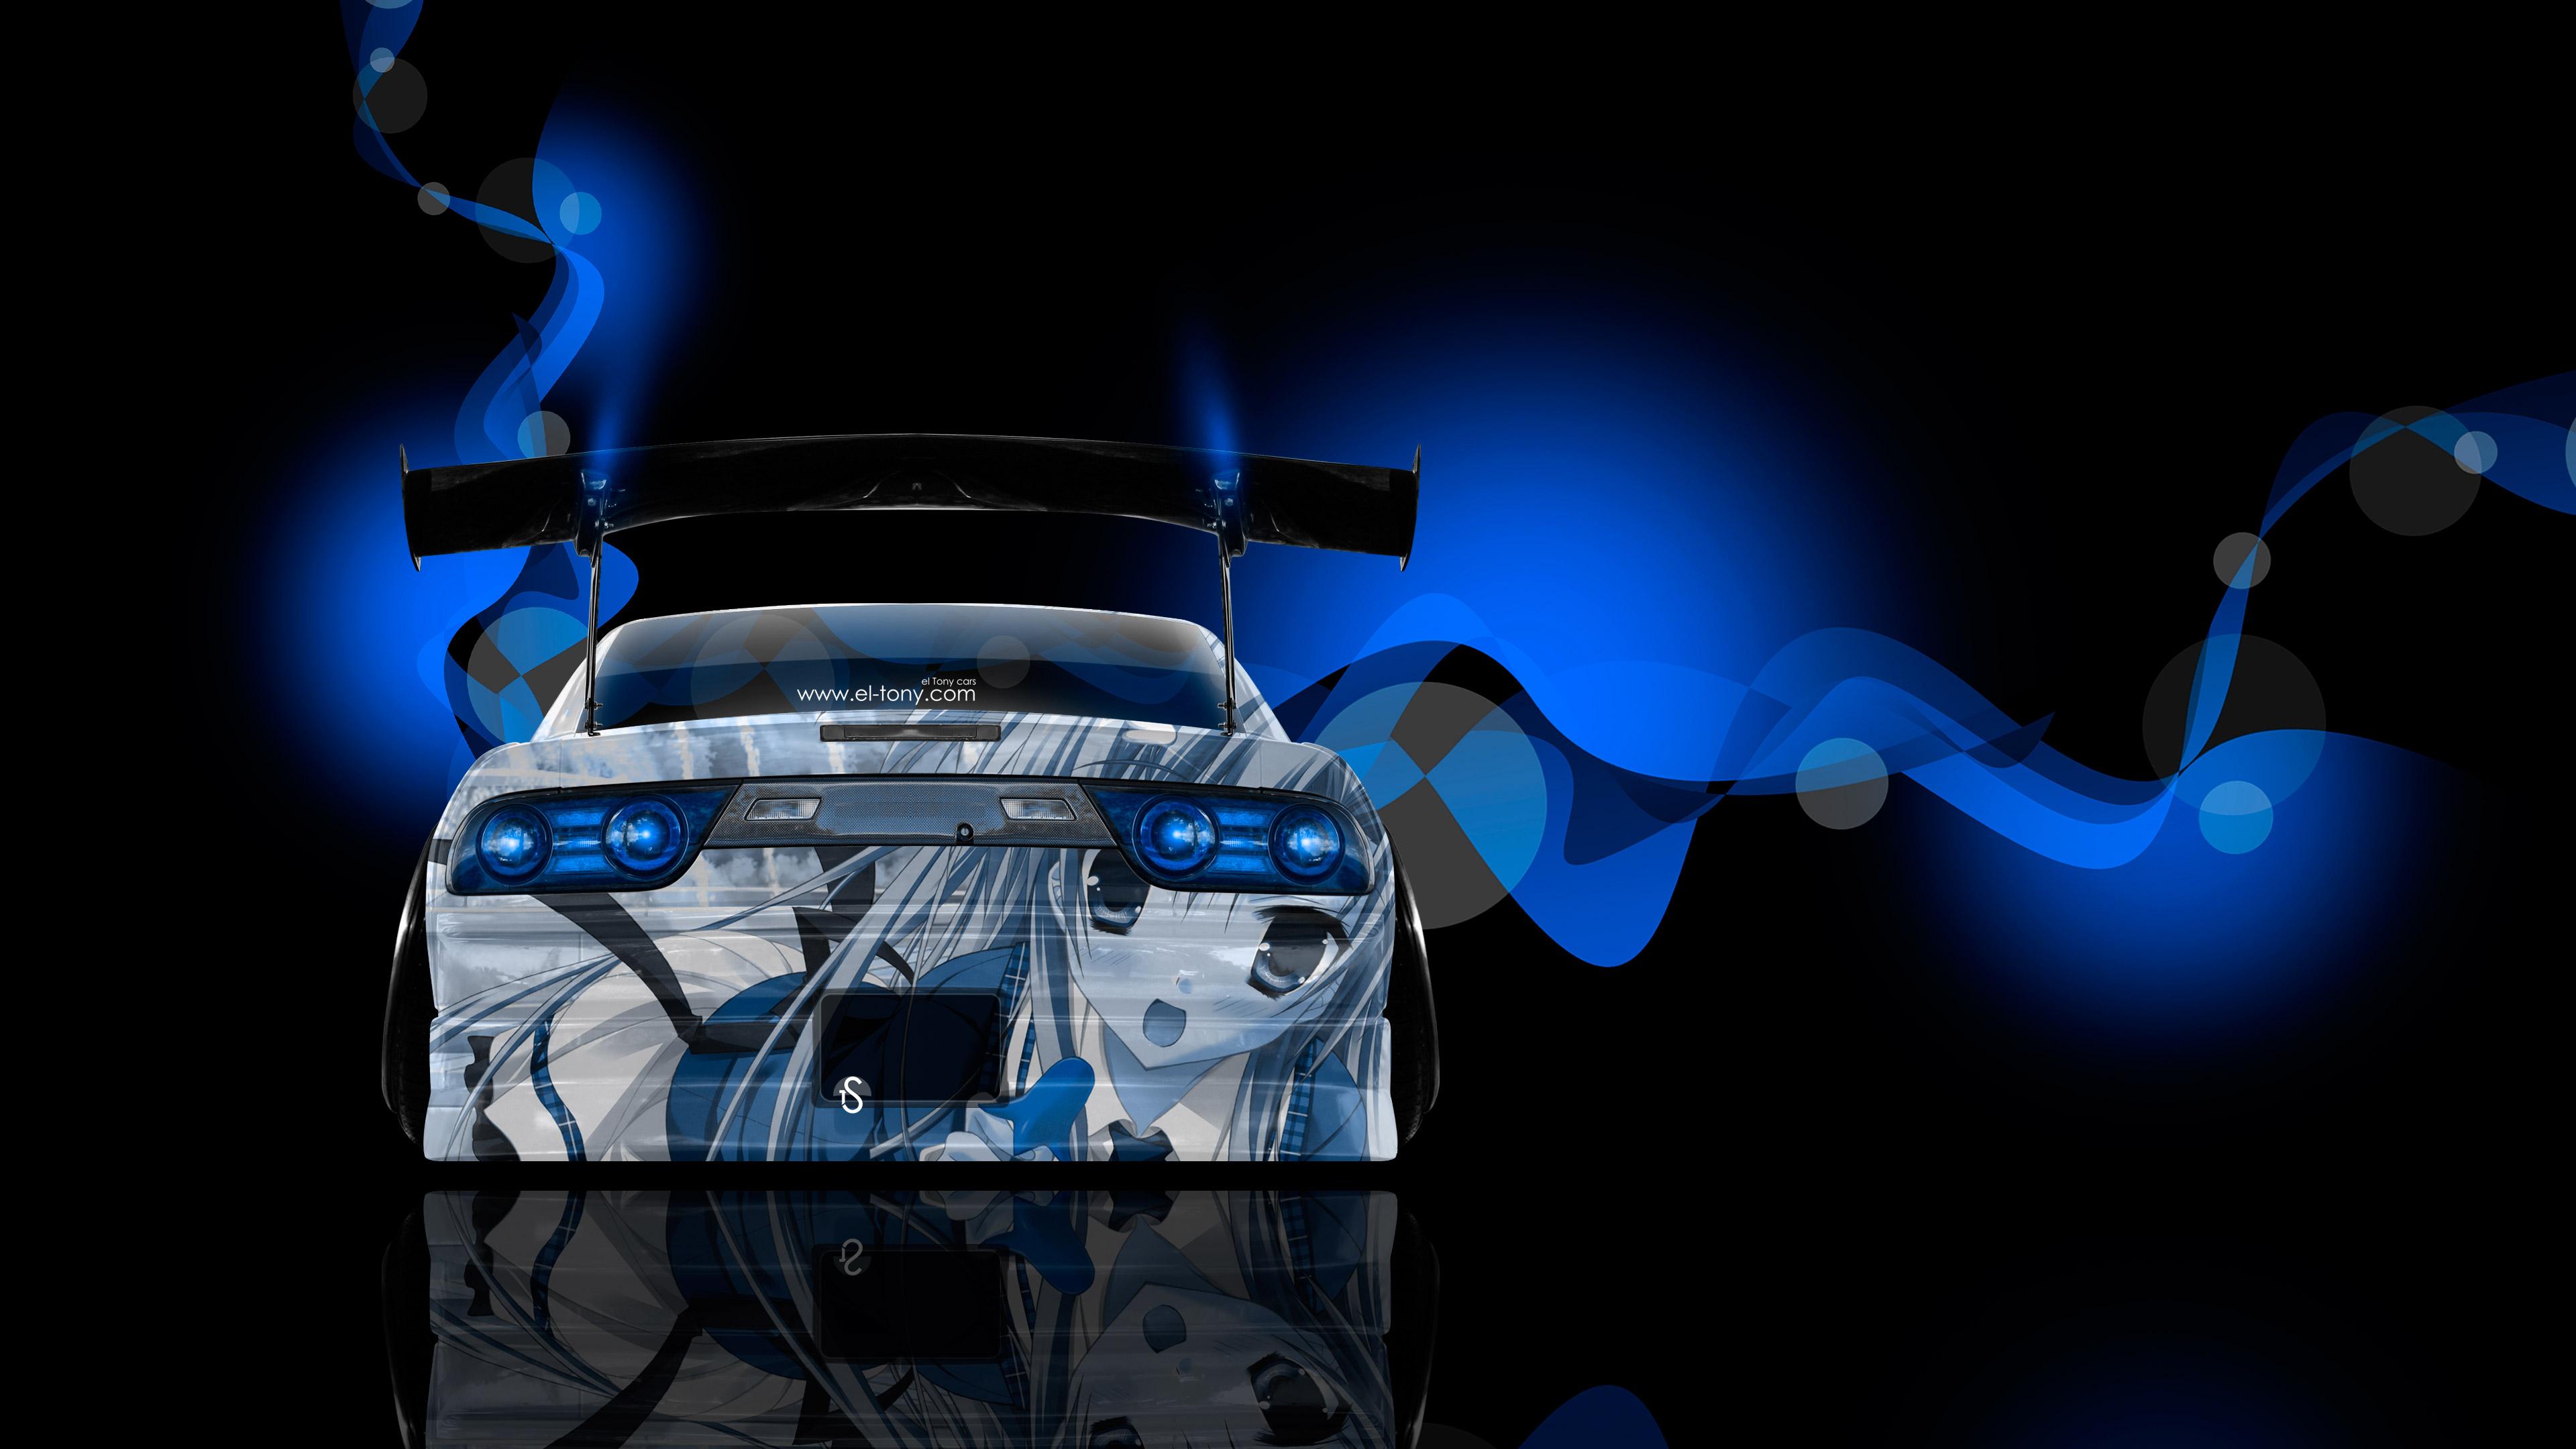 180SX JDM Back Anime Girl Aerography Car 2014 Blue Neon Effects 4K 3840x2160